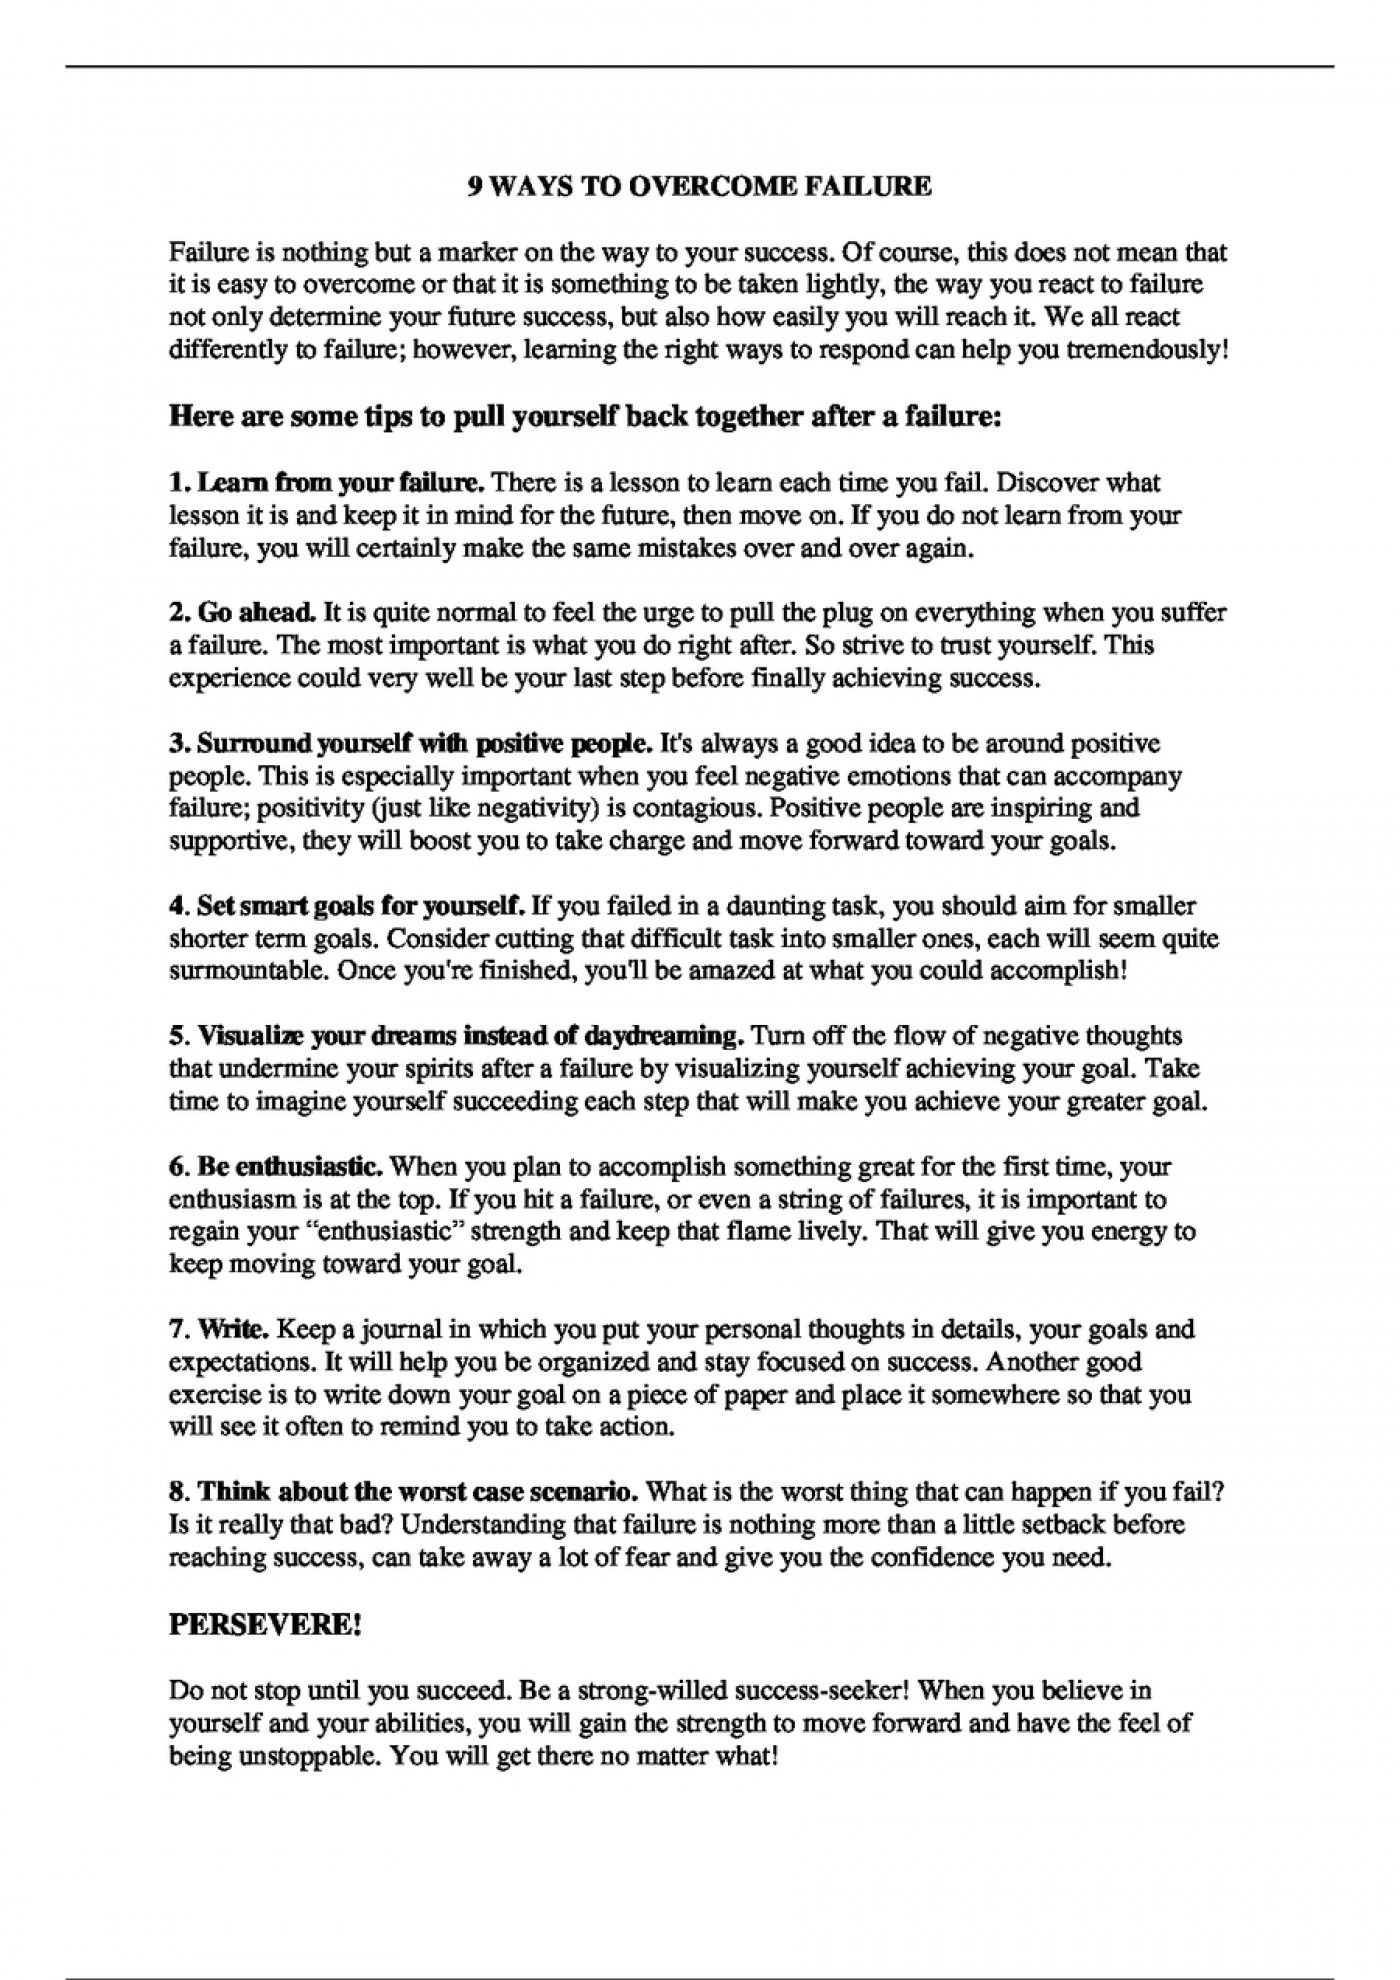 Graduate school application letter